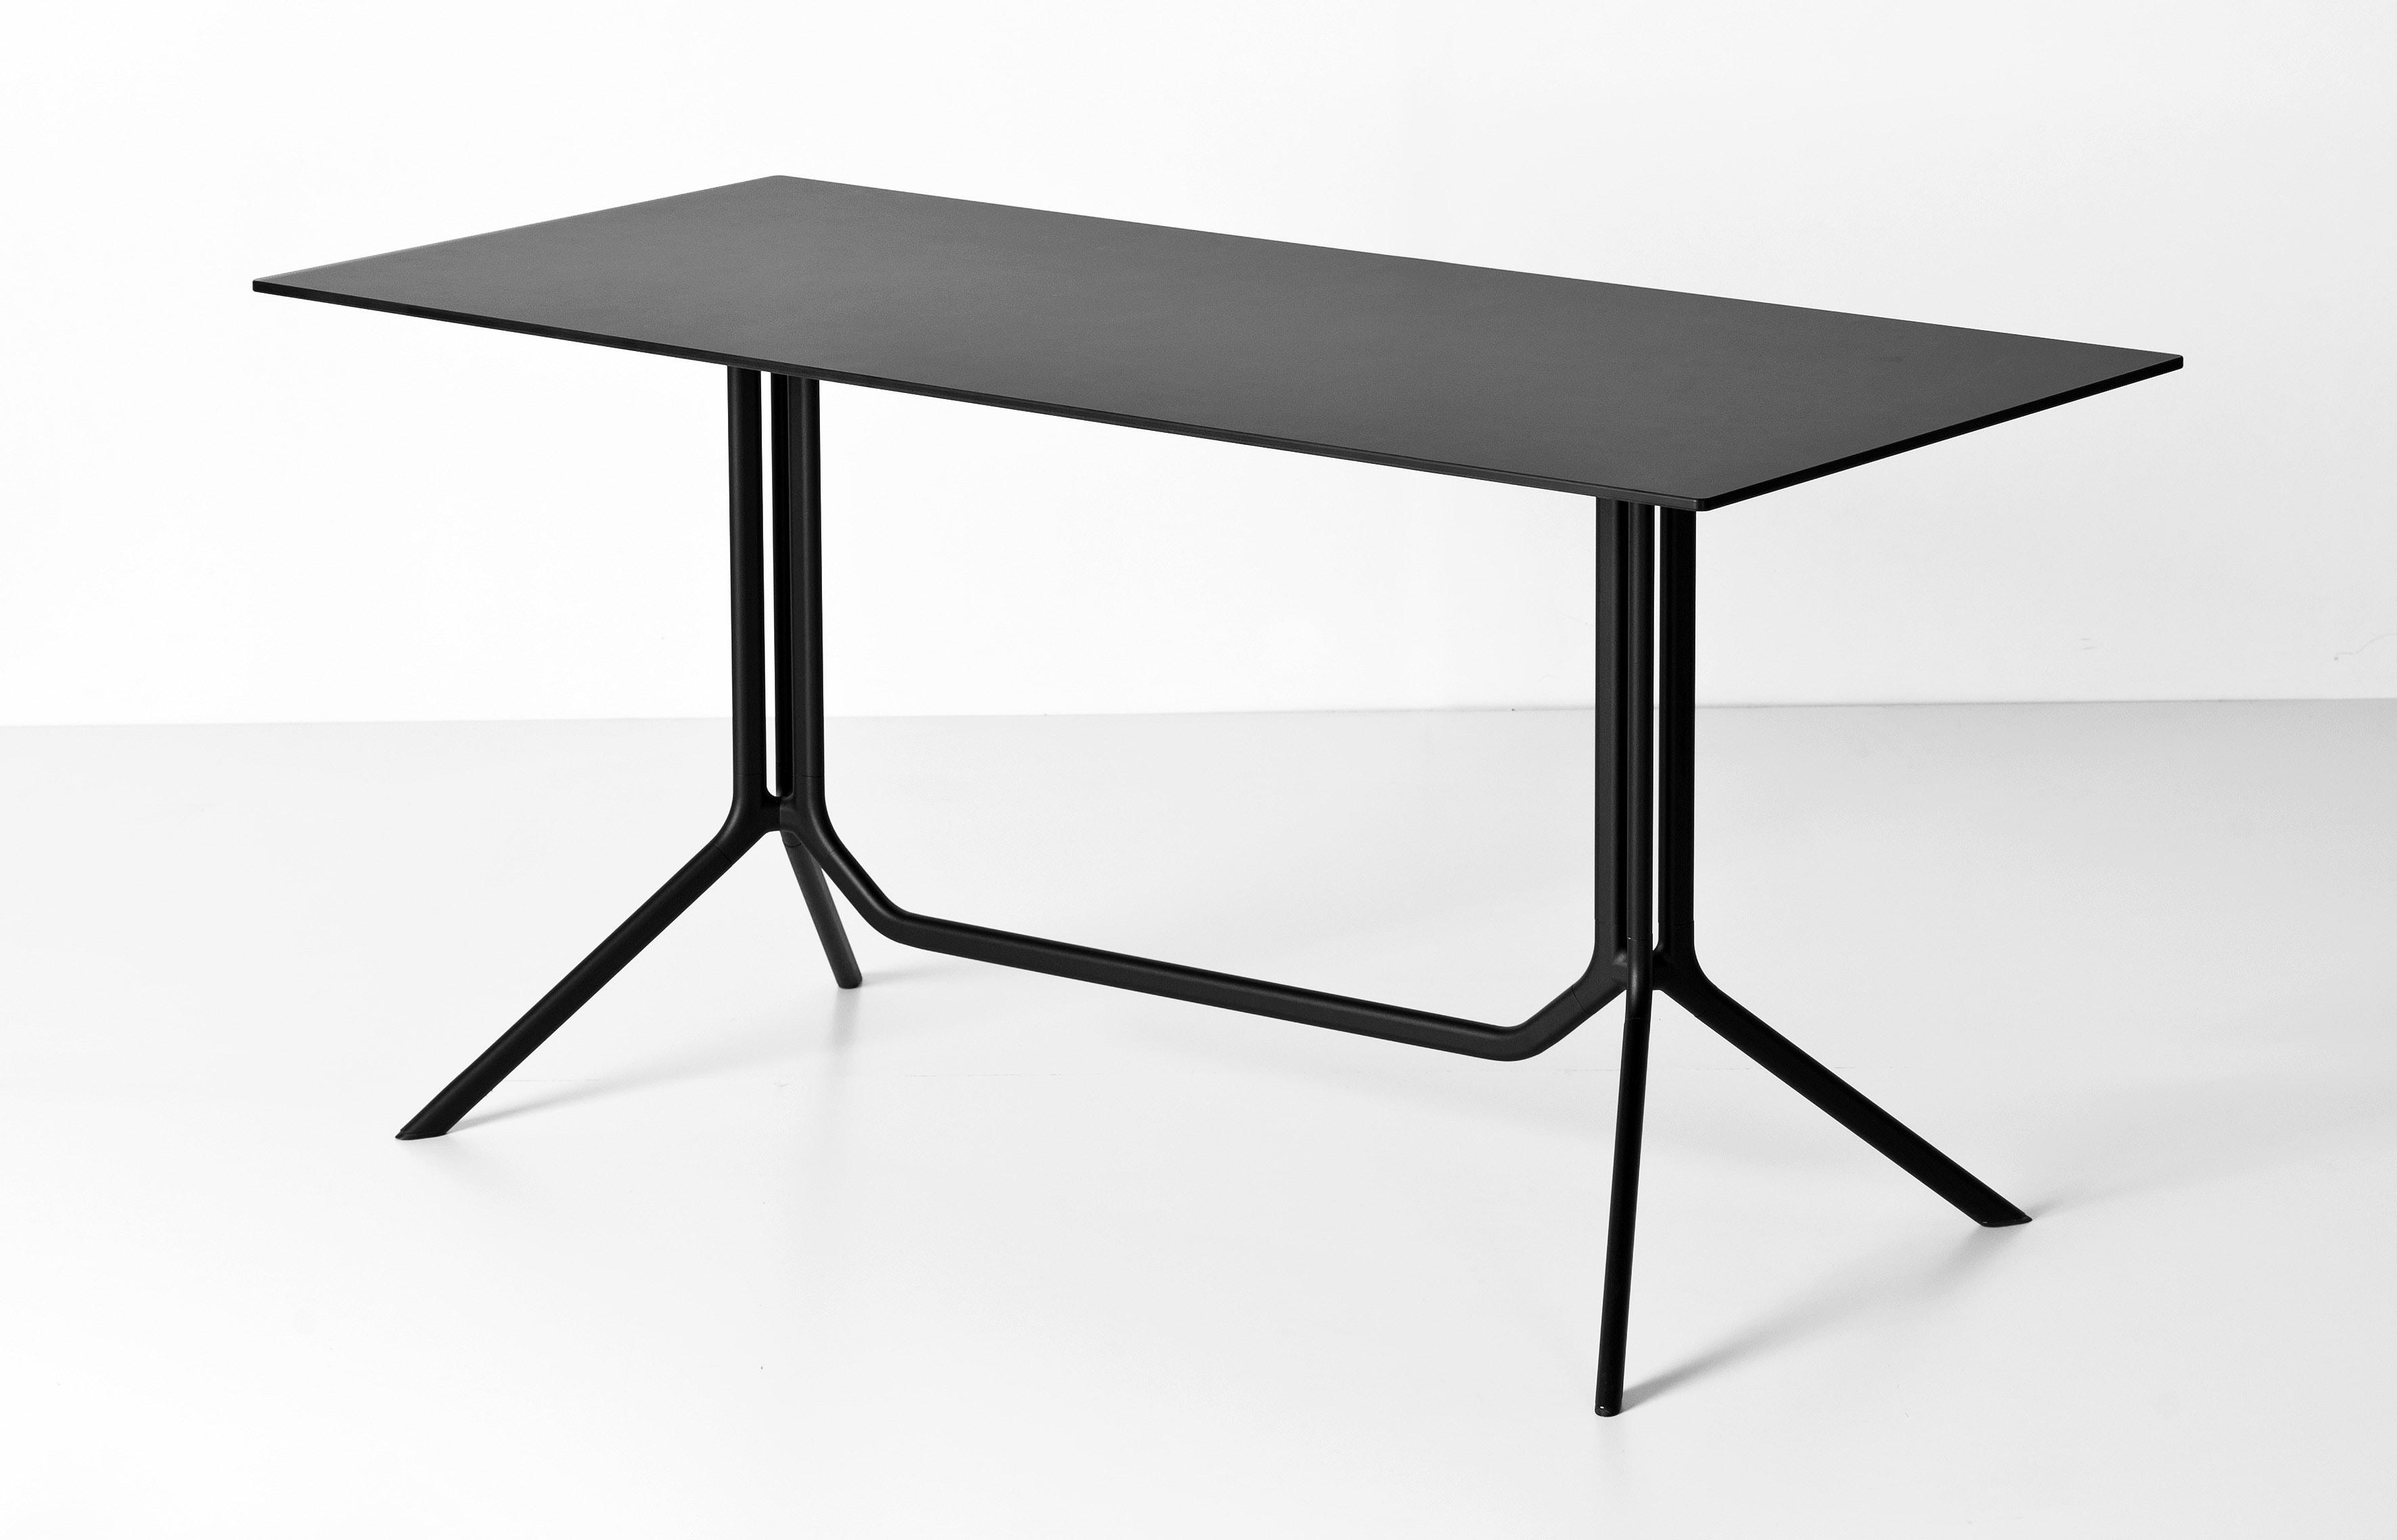 Poule dining tables fanuli furniture for Table kristalia